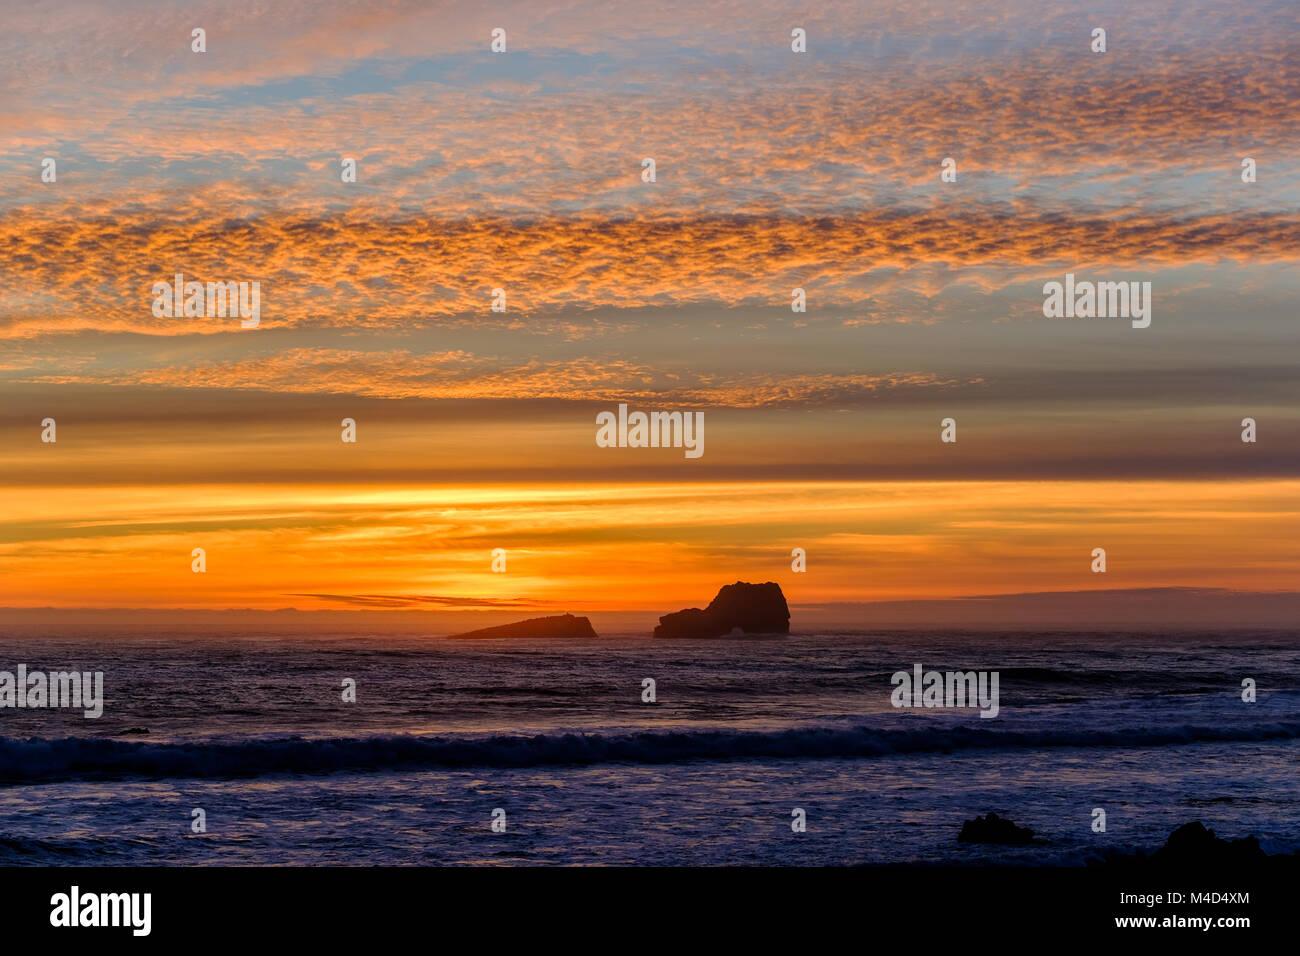 Pacific coast sunset, Big Sur, California, Estados Unidos. Imagen De Stock